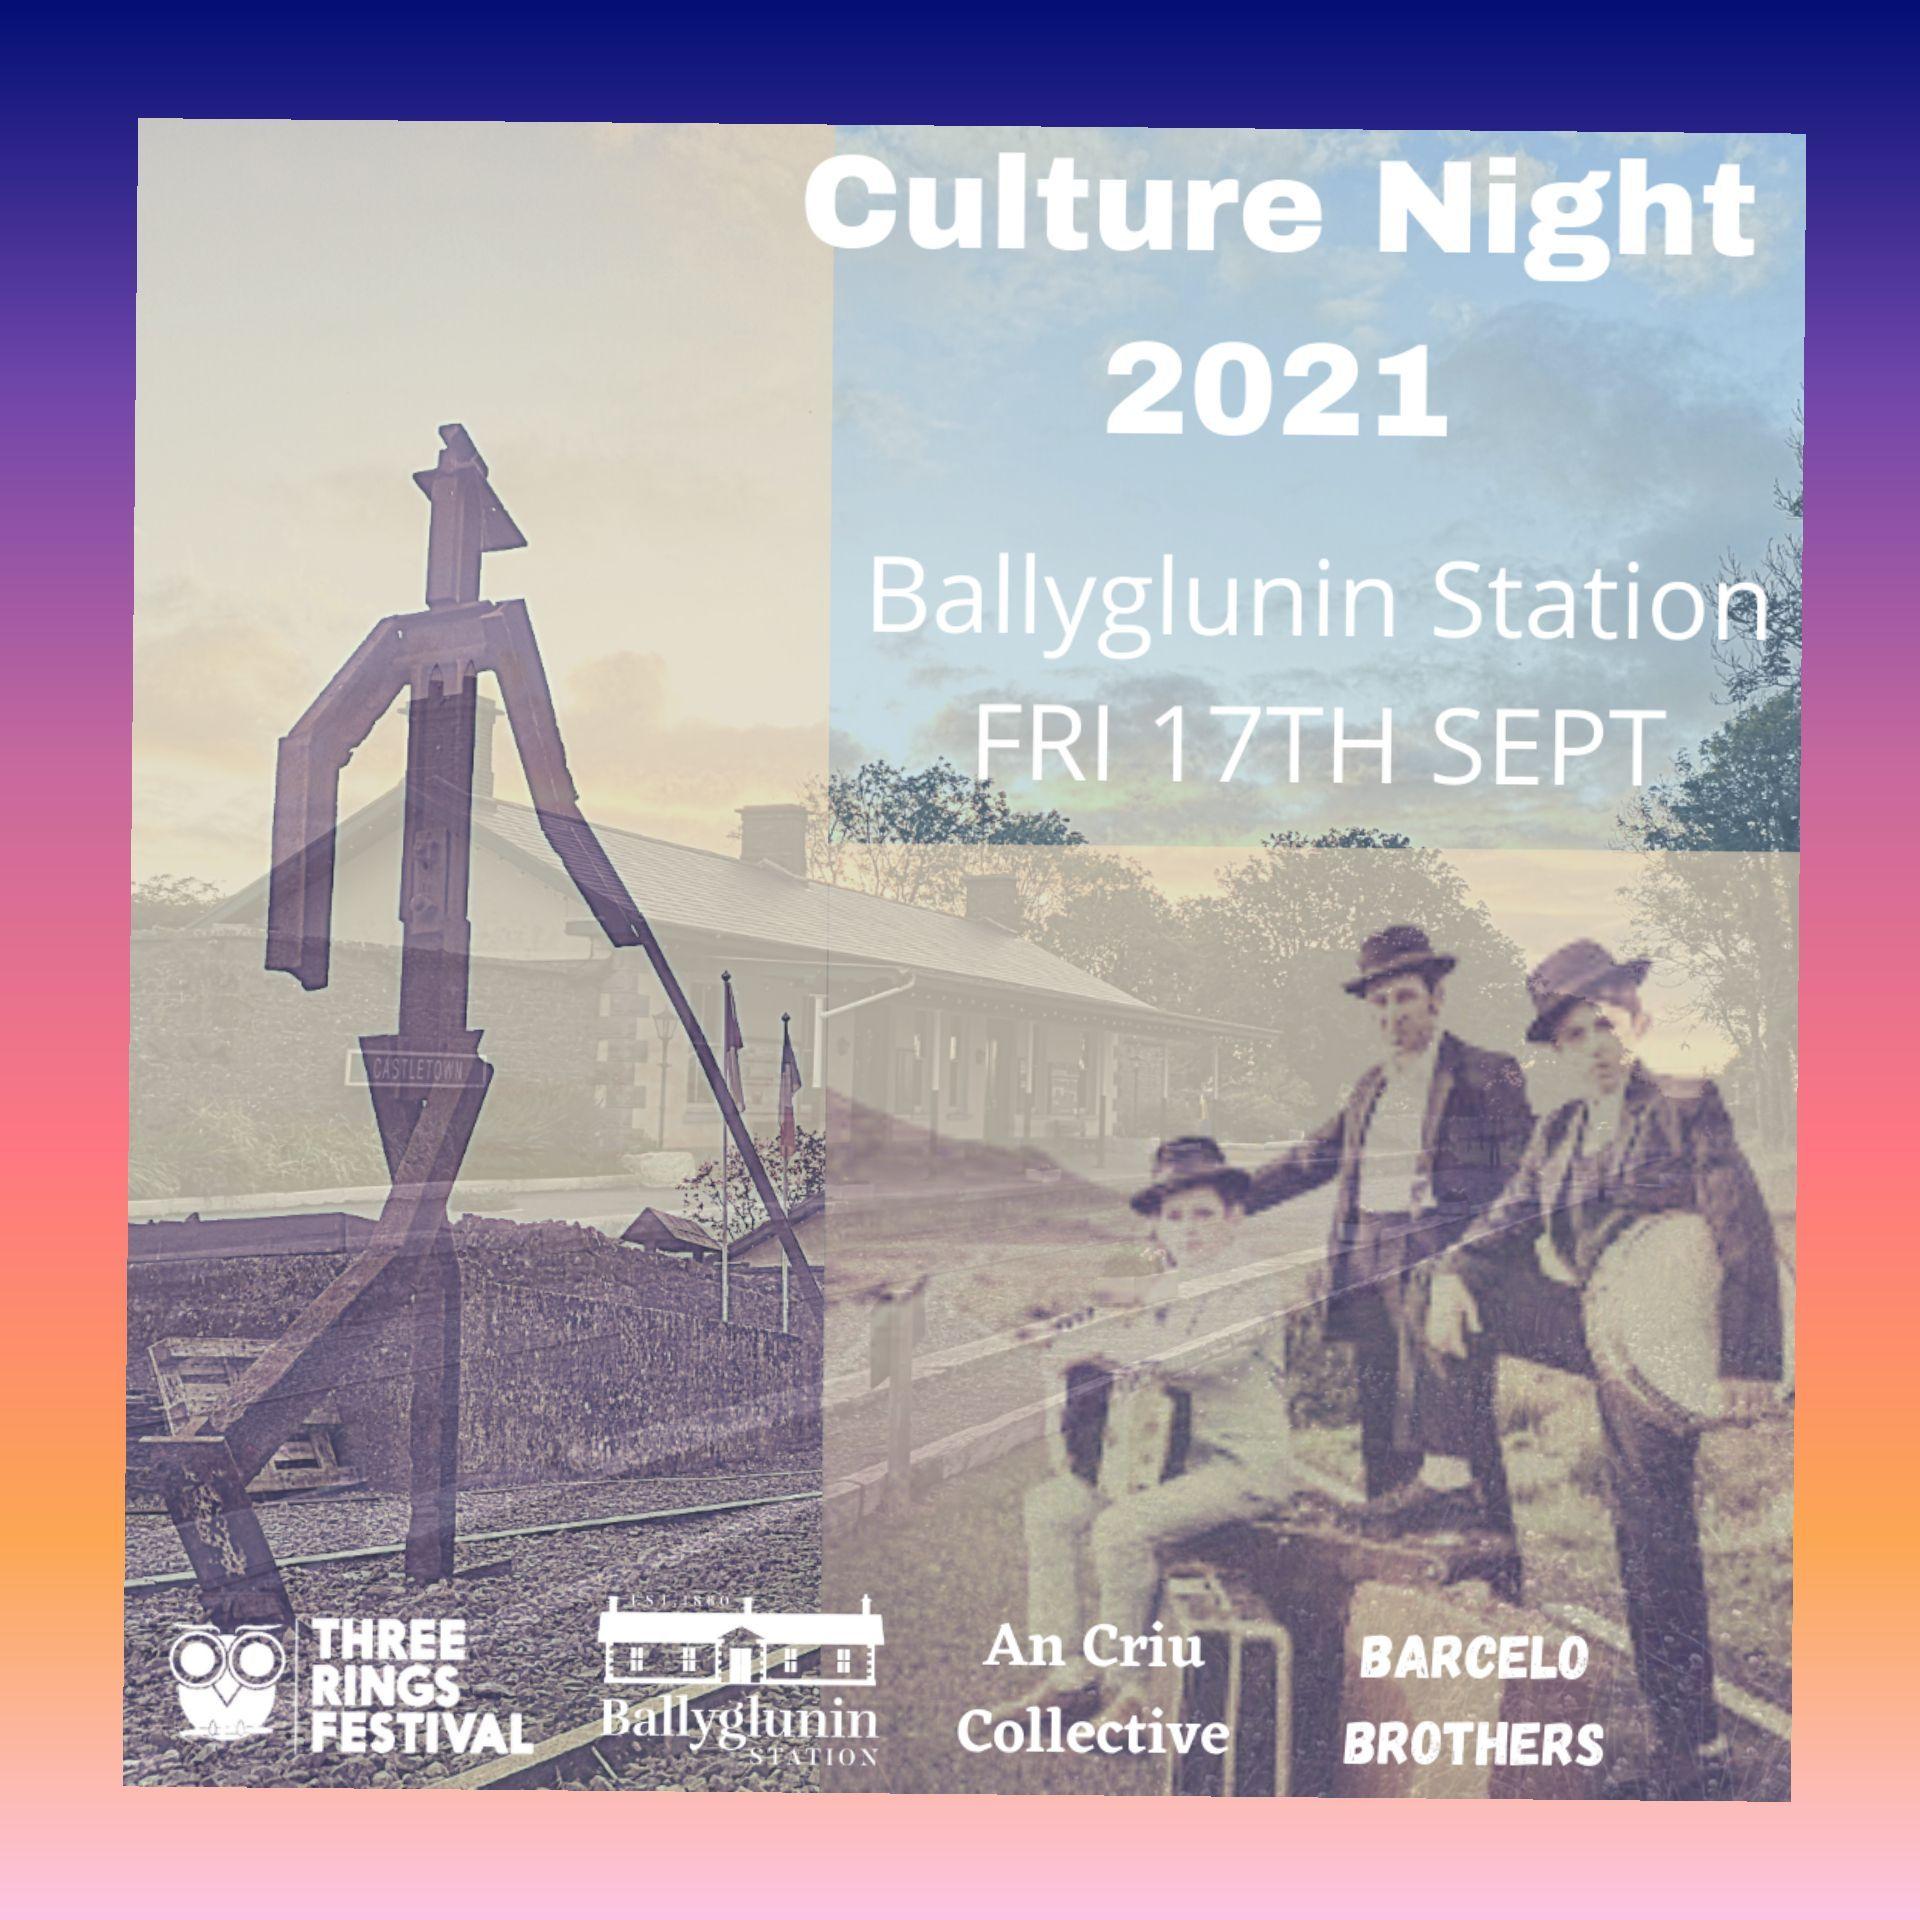 Culture Night 2021 Image